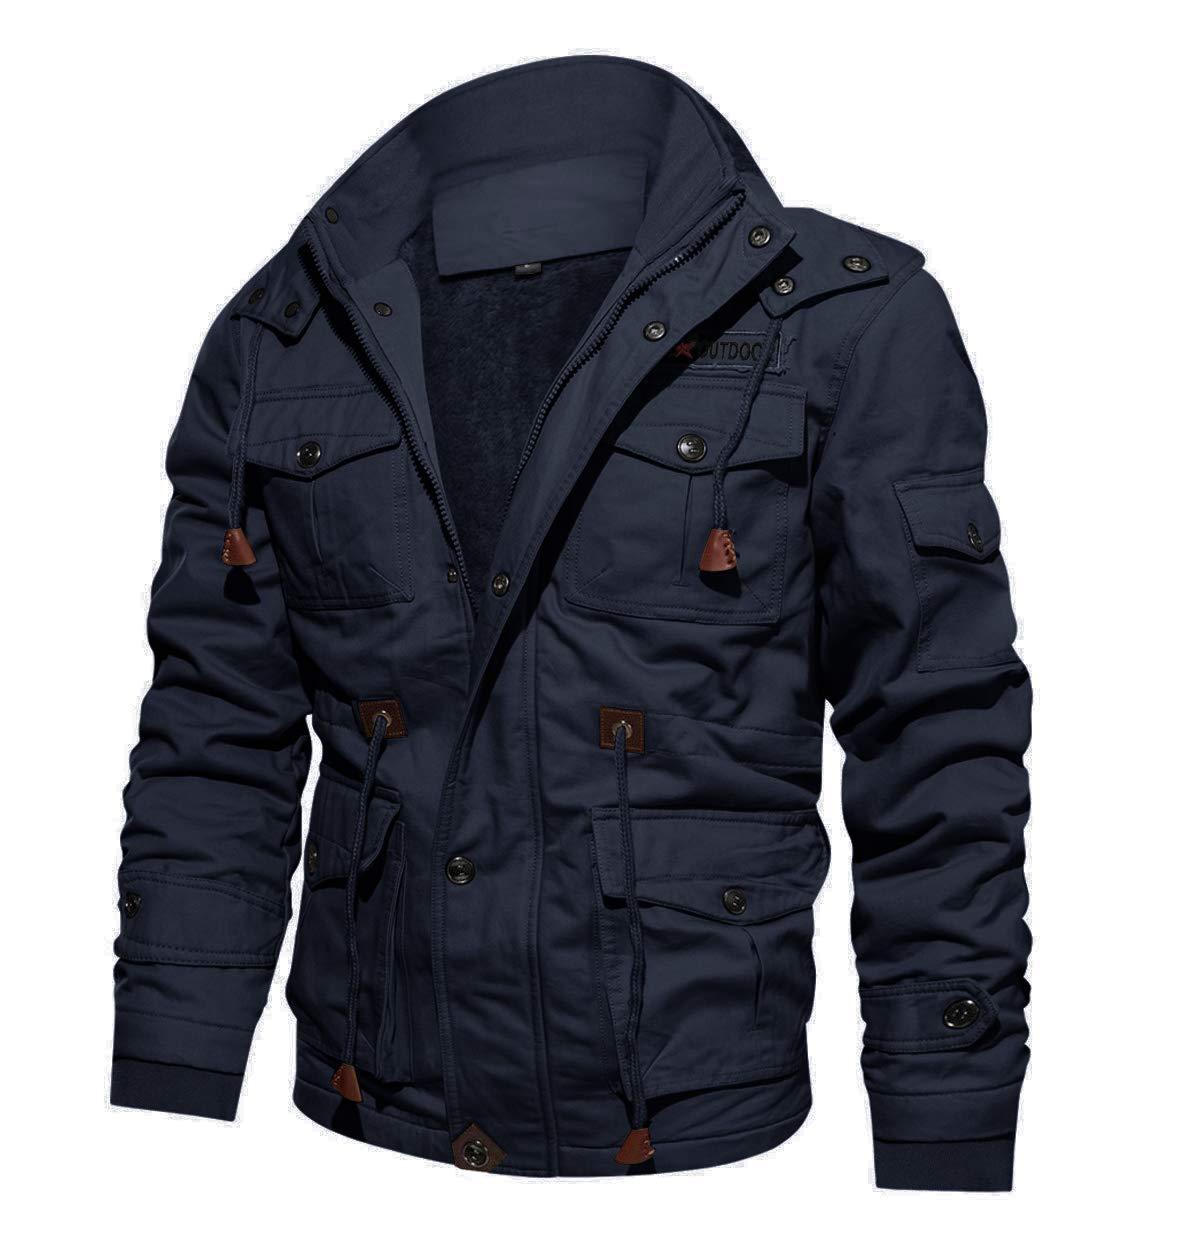 CRYSULLY Men's Multi Cargo Pocket Tactical Safari Jacket Fall Cotton Field Fleece Jacket Navy Blue by CRYSULLY